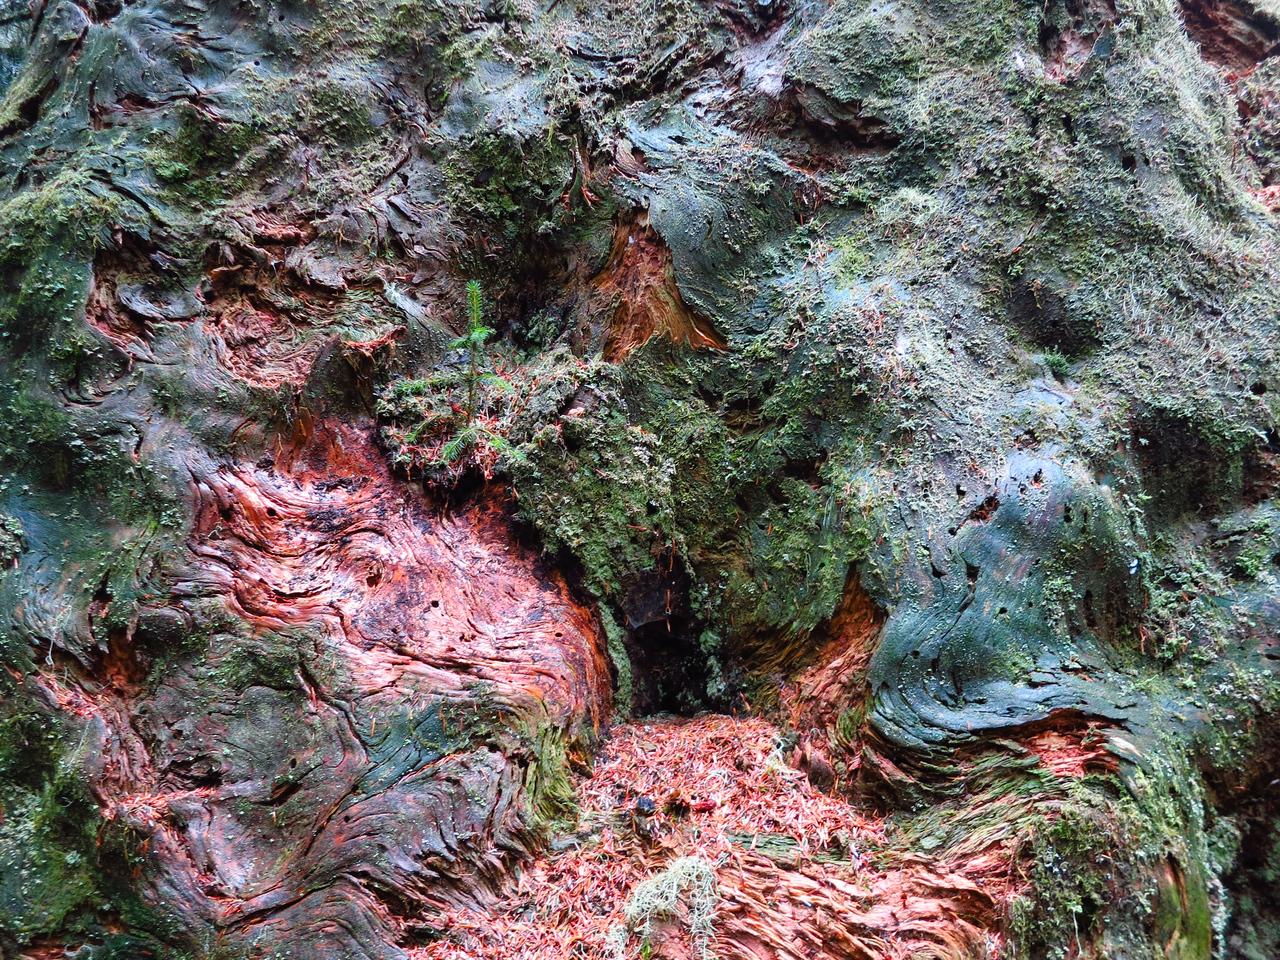 Stump textures.